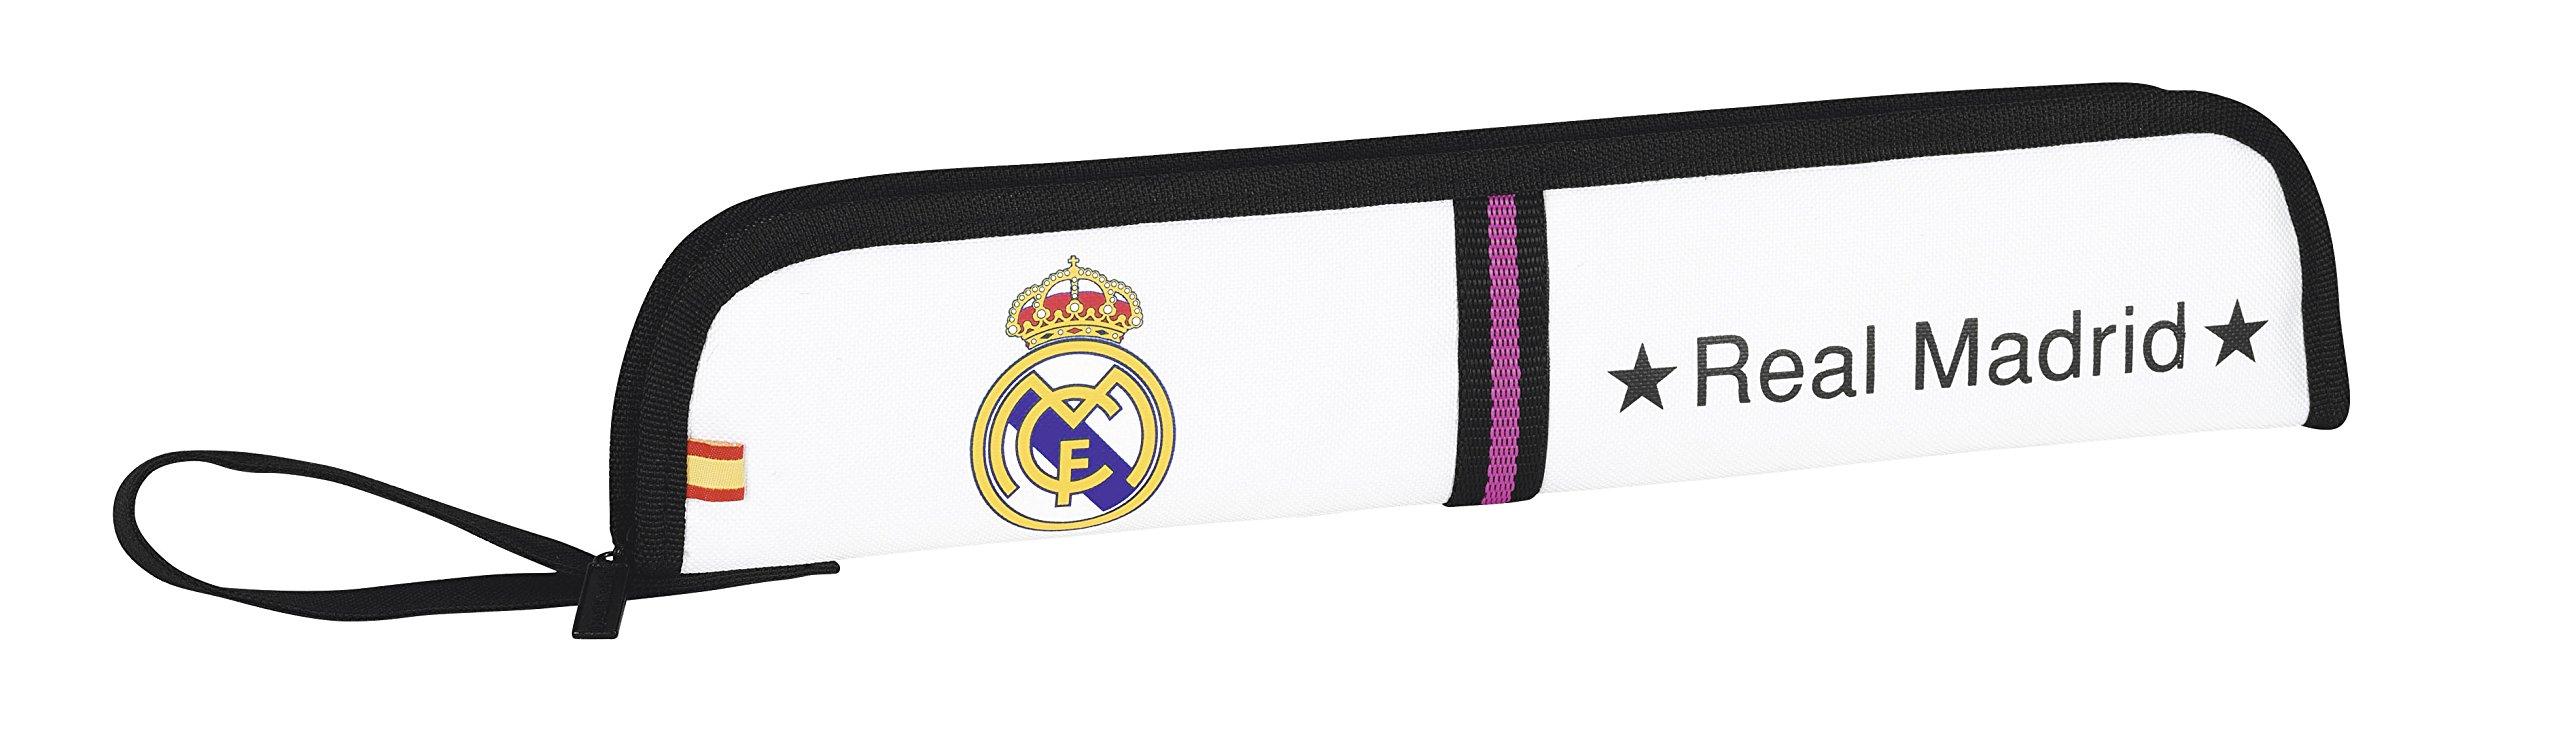 Safta – Portaflautas Real Madrid, 37 x 8 x 2 cm (811457284)